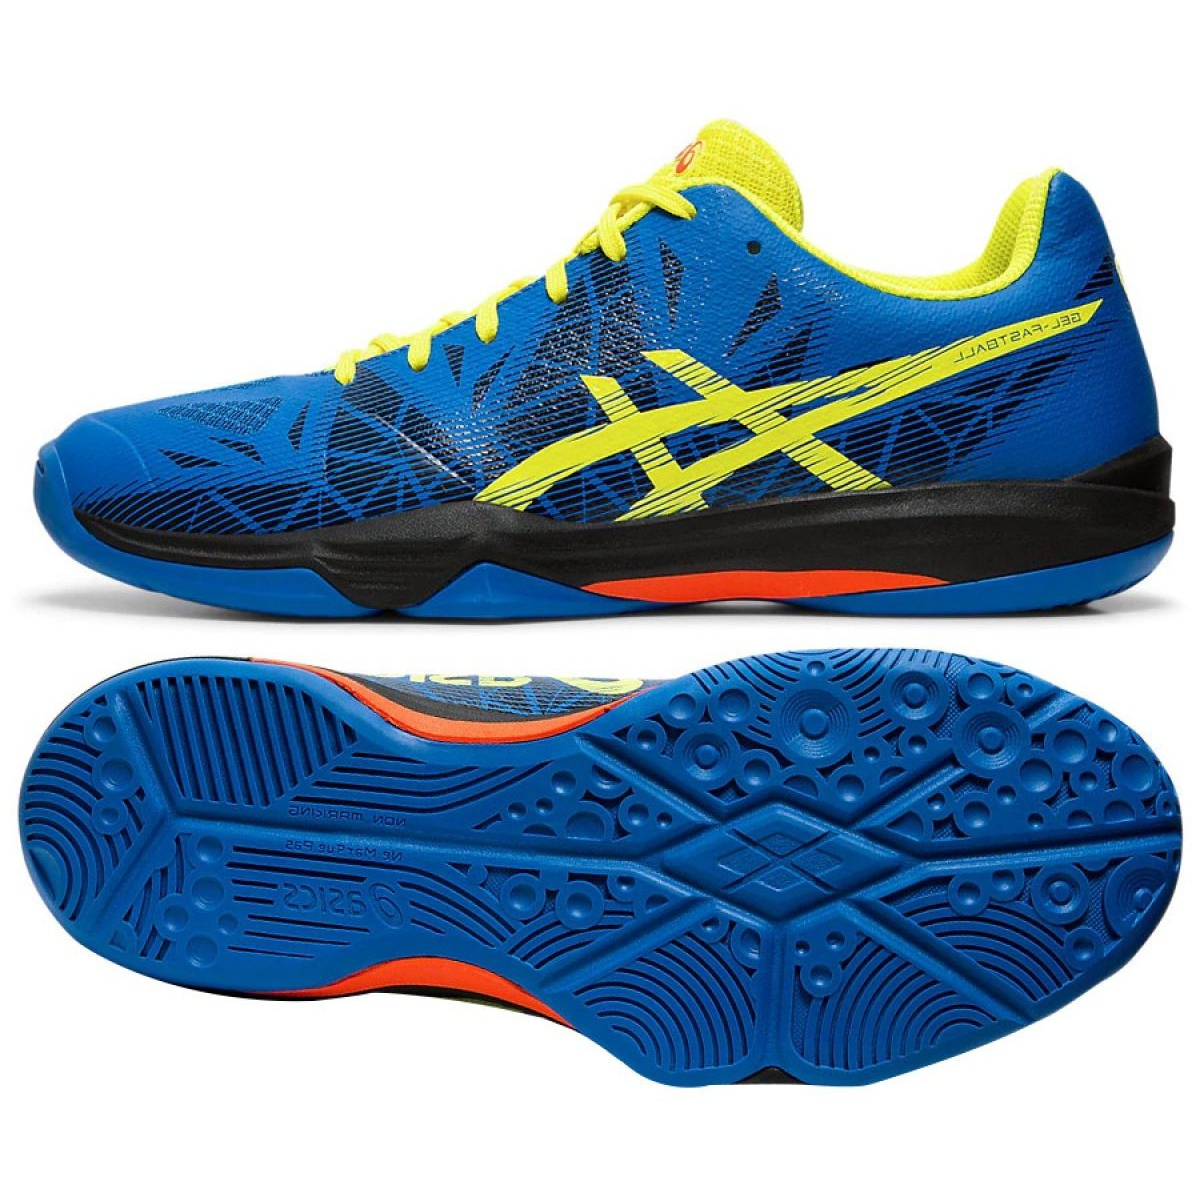 Asics Gel Fastball 3 M E712N-401 shoes blue blue   eBay